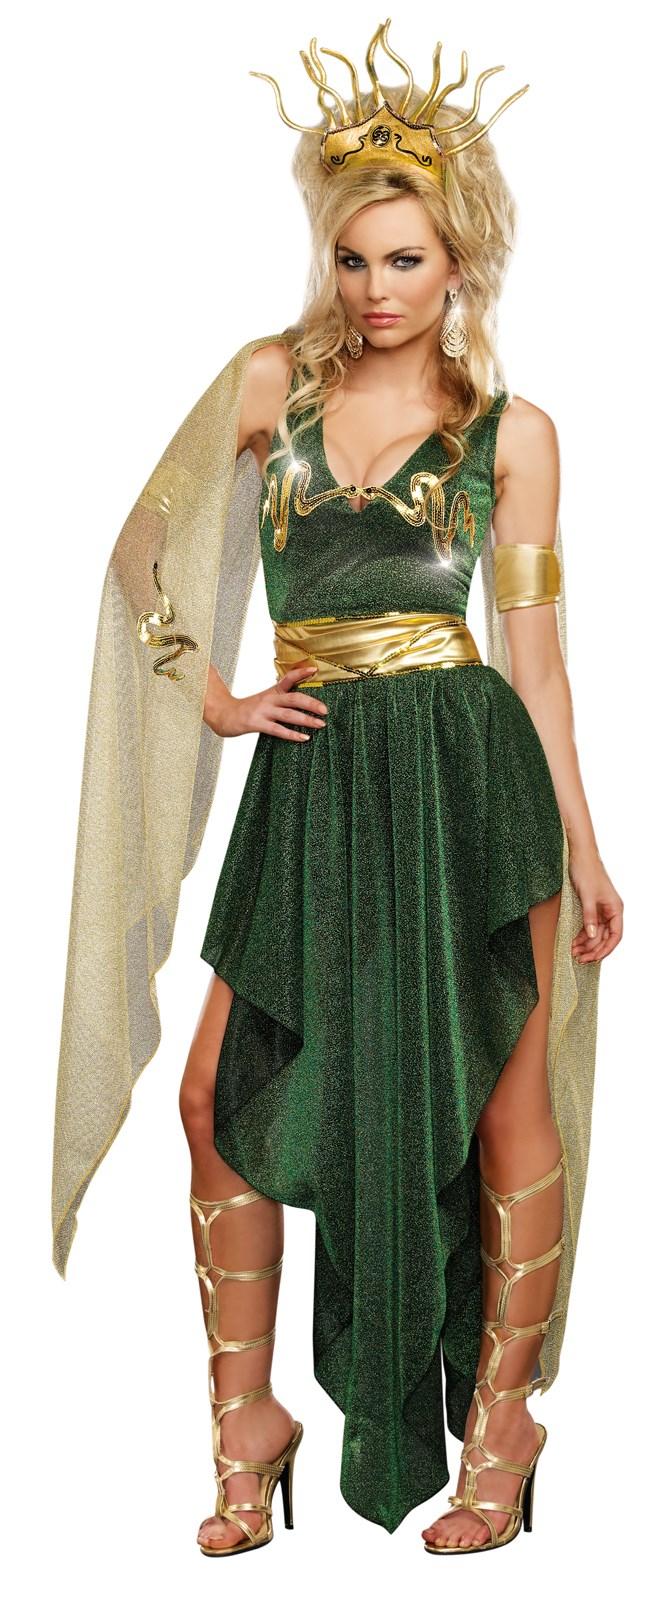 sultry medusa costume buycostumes com armor of god clipart transparent armor of god clip art free printable